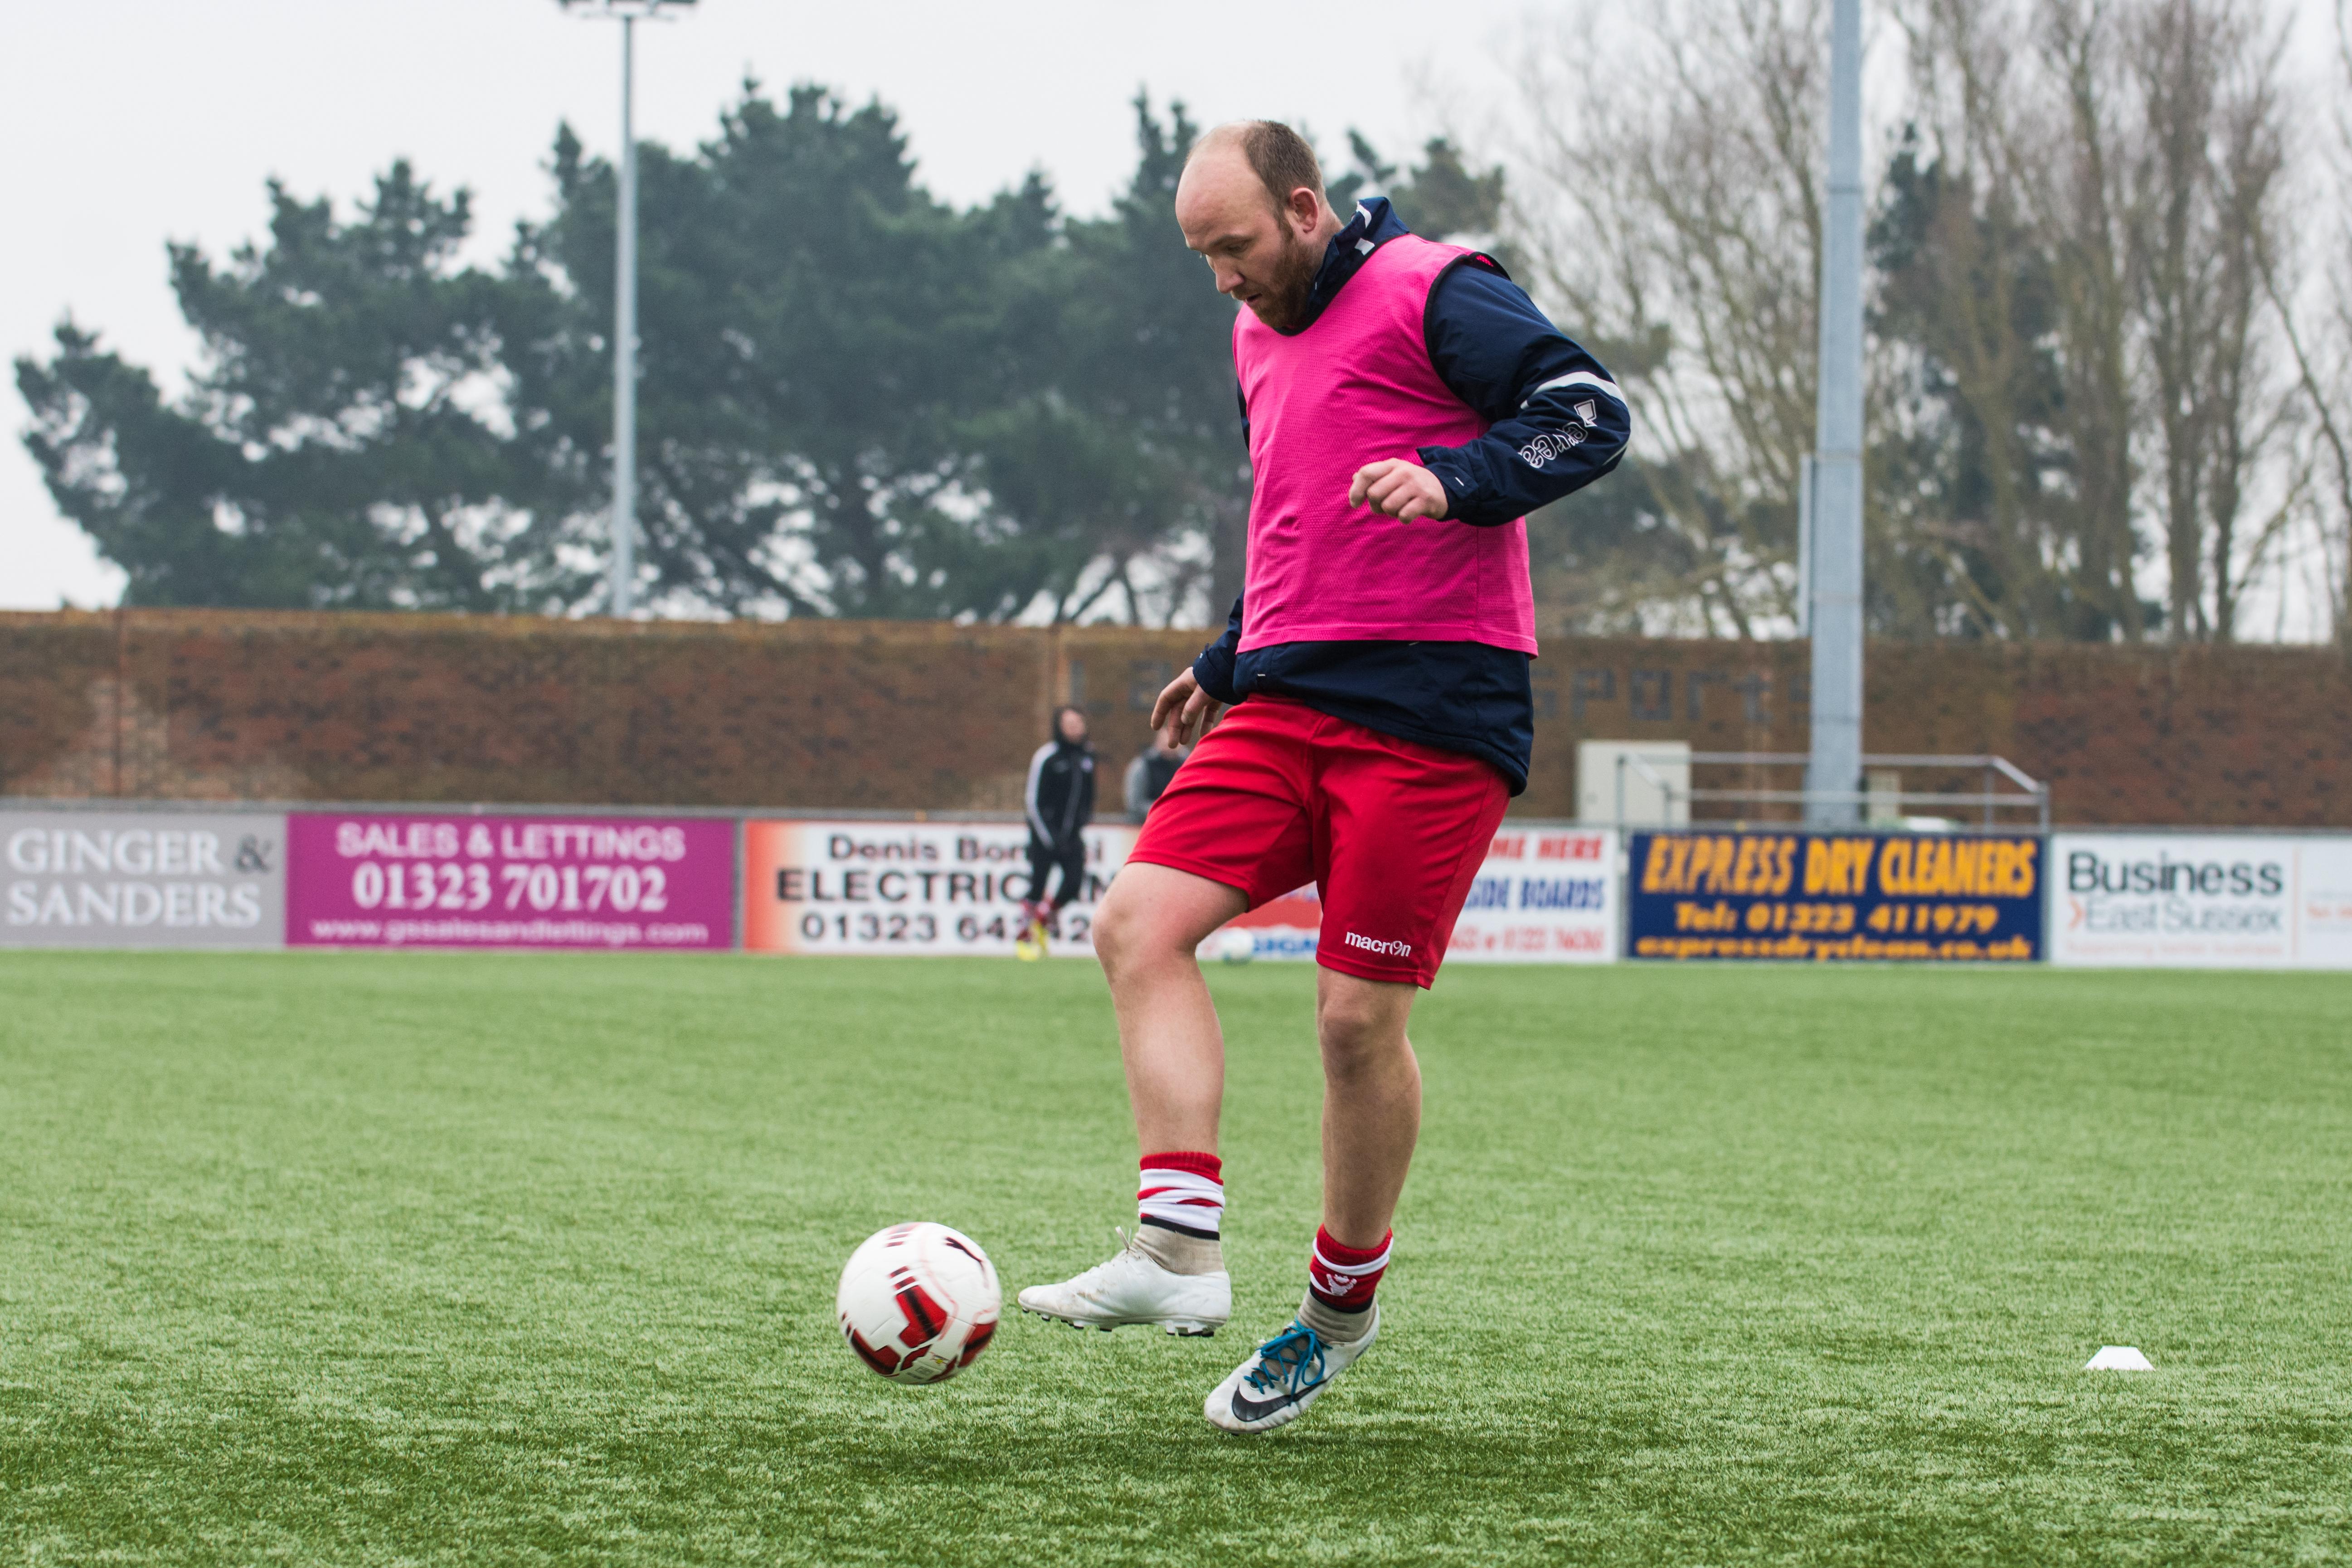 DAVID_JEFFERY Langney Wanderers FC vs Bexhill United FC 03.03.18 19